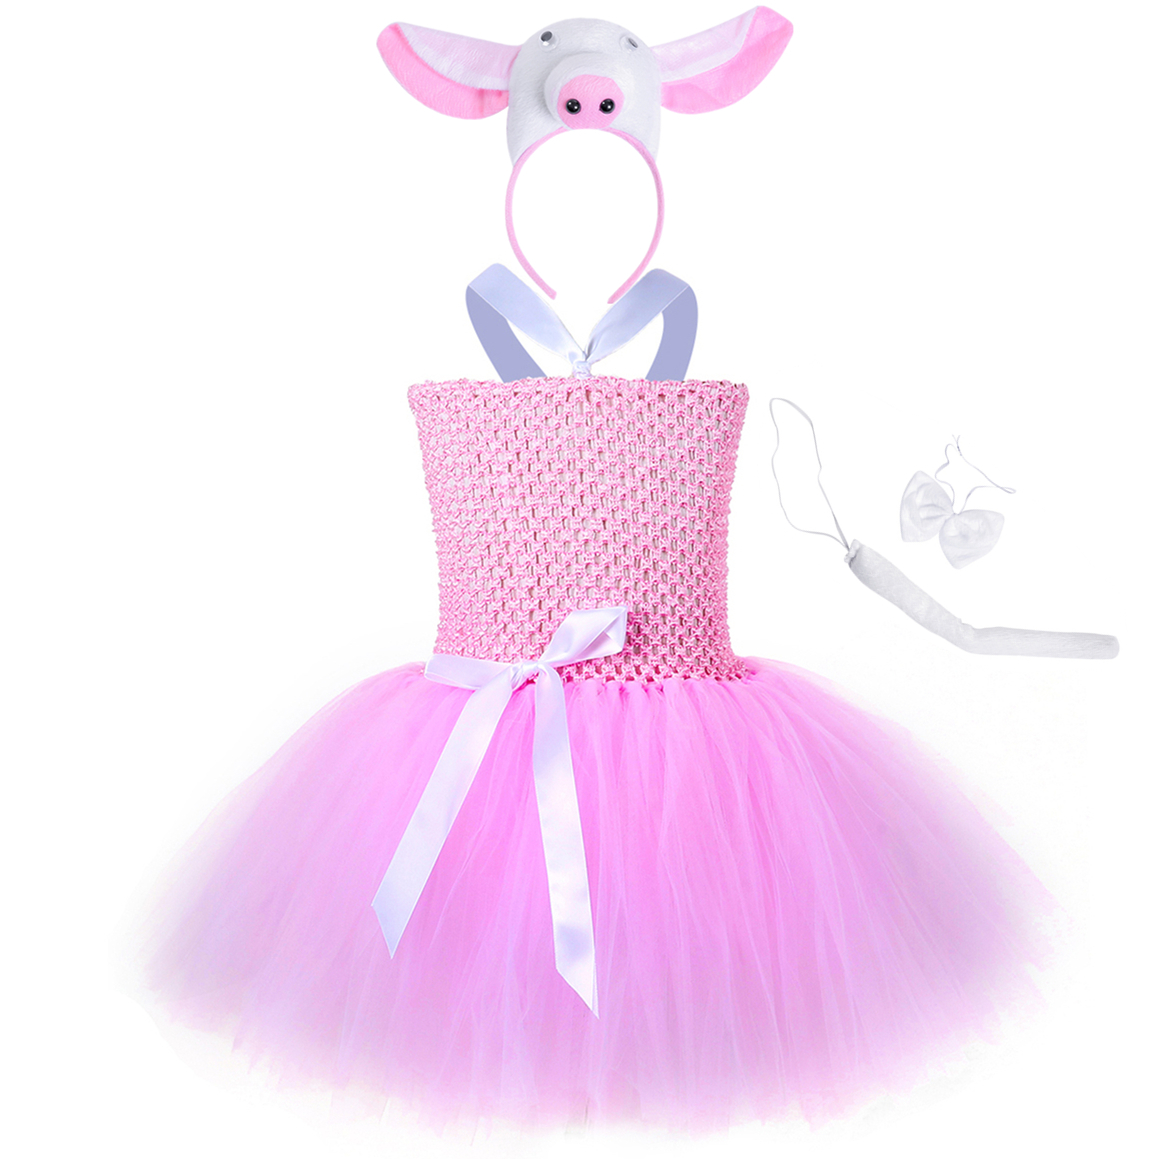 Baby Toddler Girl Princess Costume Set Party Outfit Kids Ballet Fancy Tutu Dress